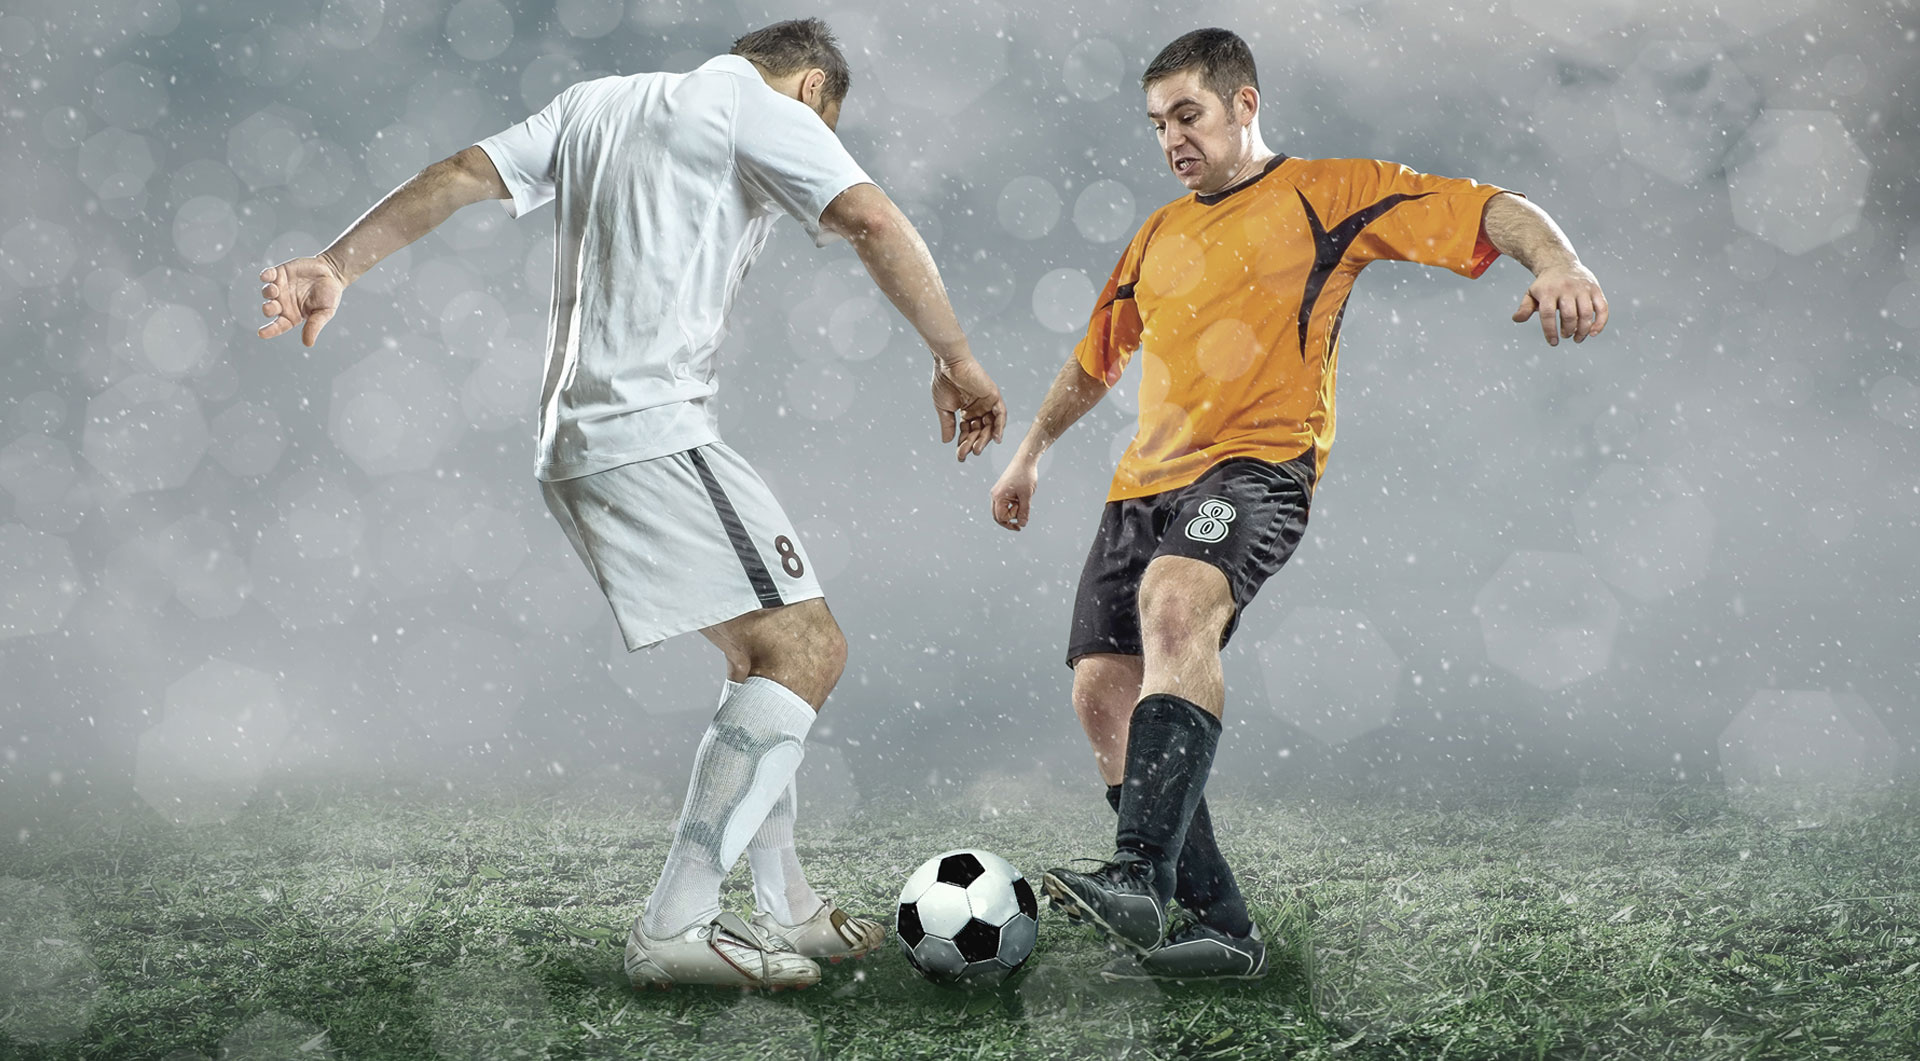 watch-s.-wawrinka-vs-j.-vesely-1st-round-online